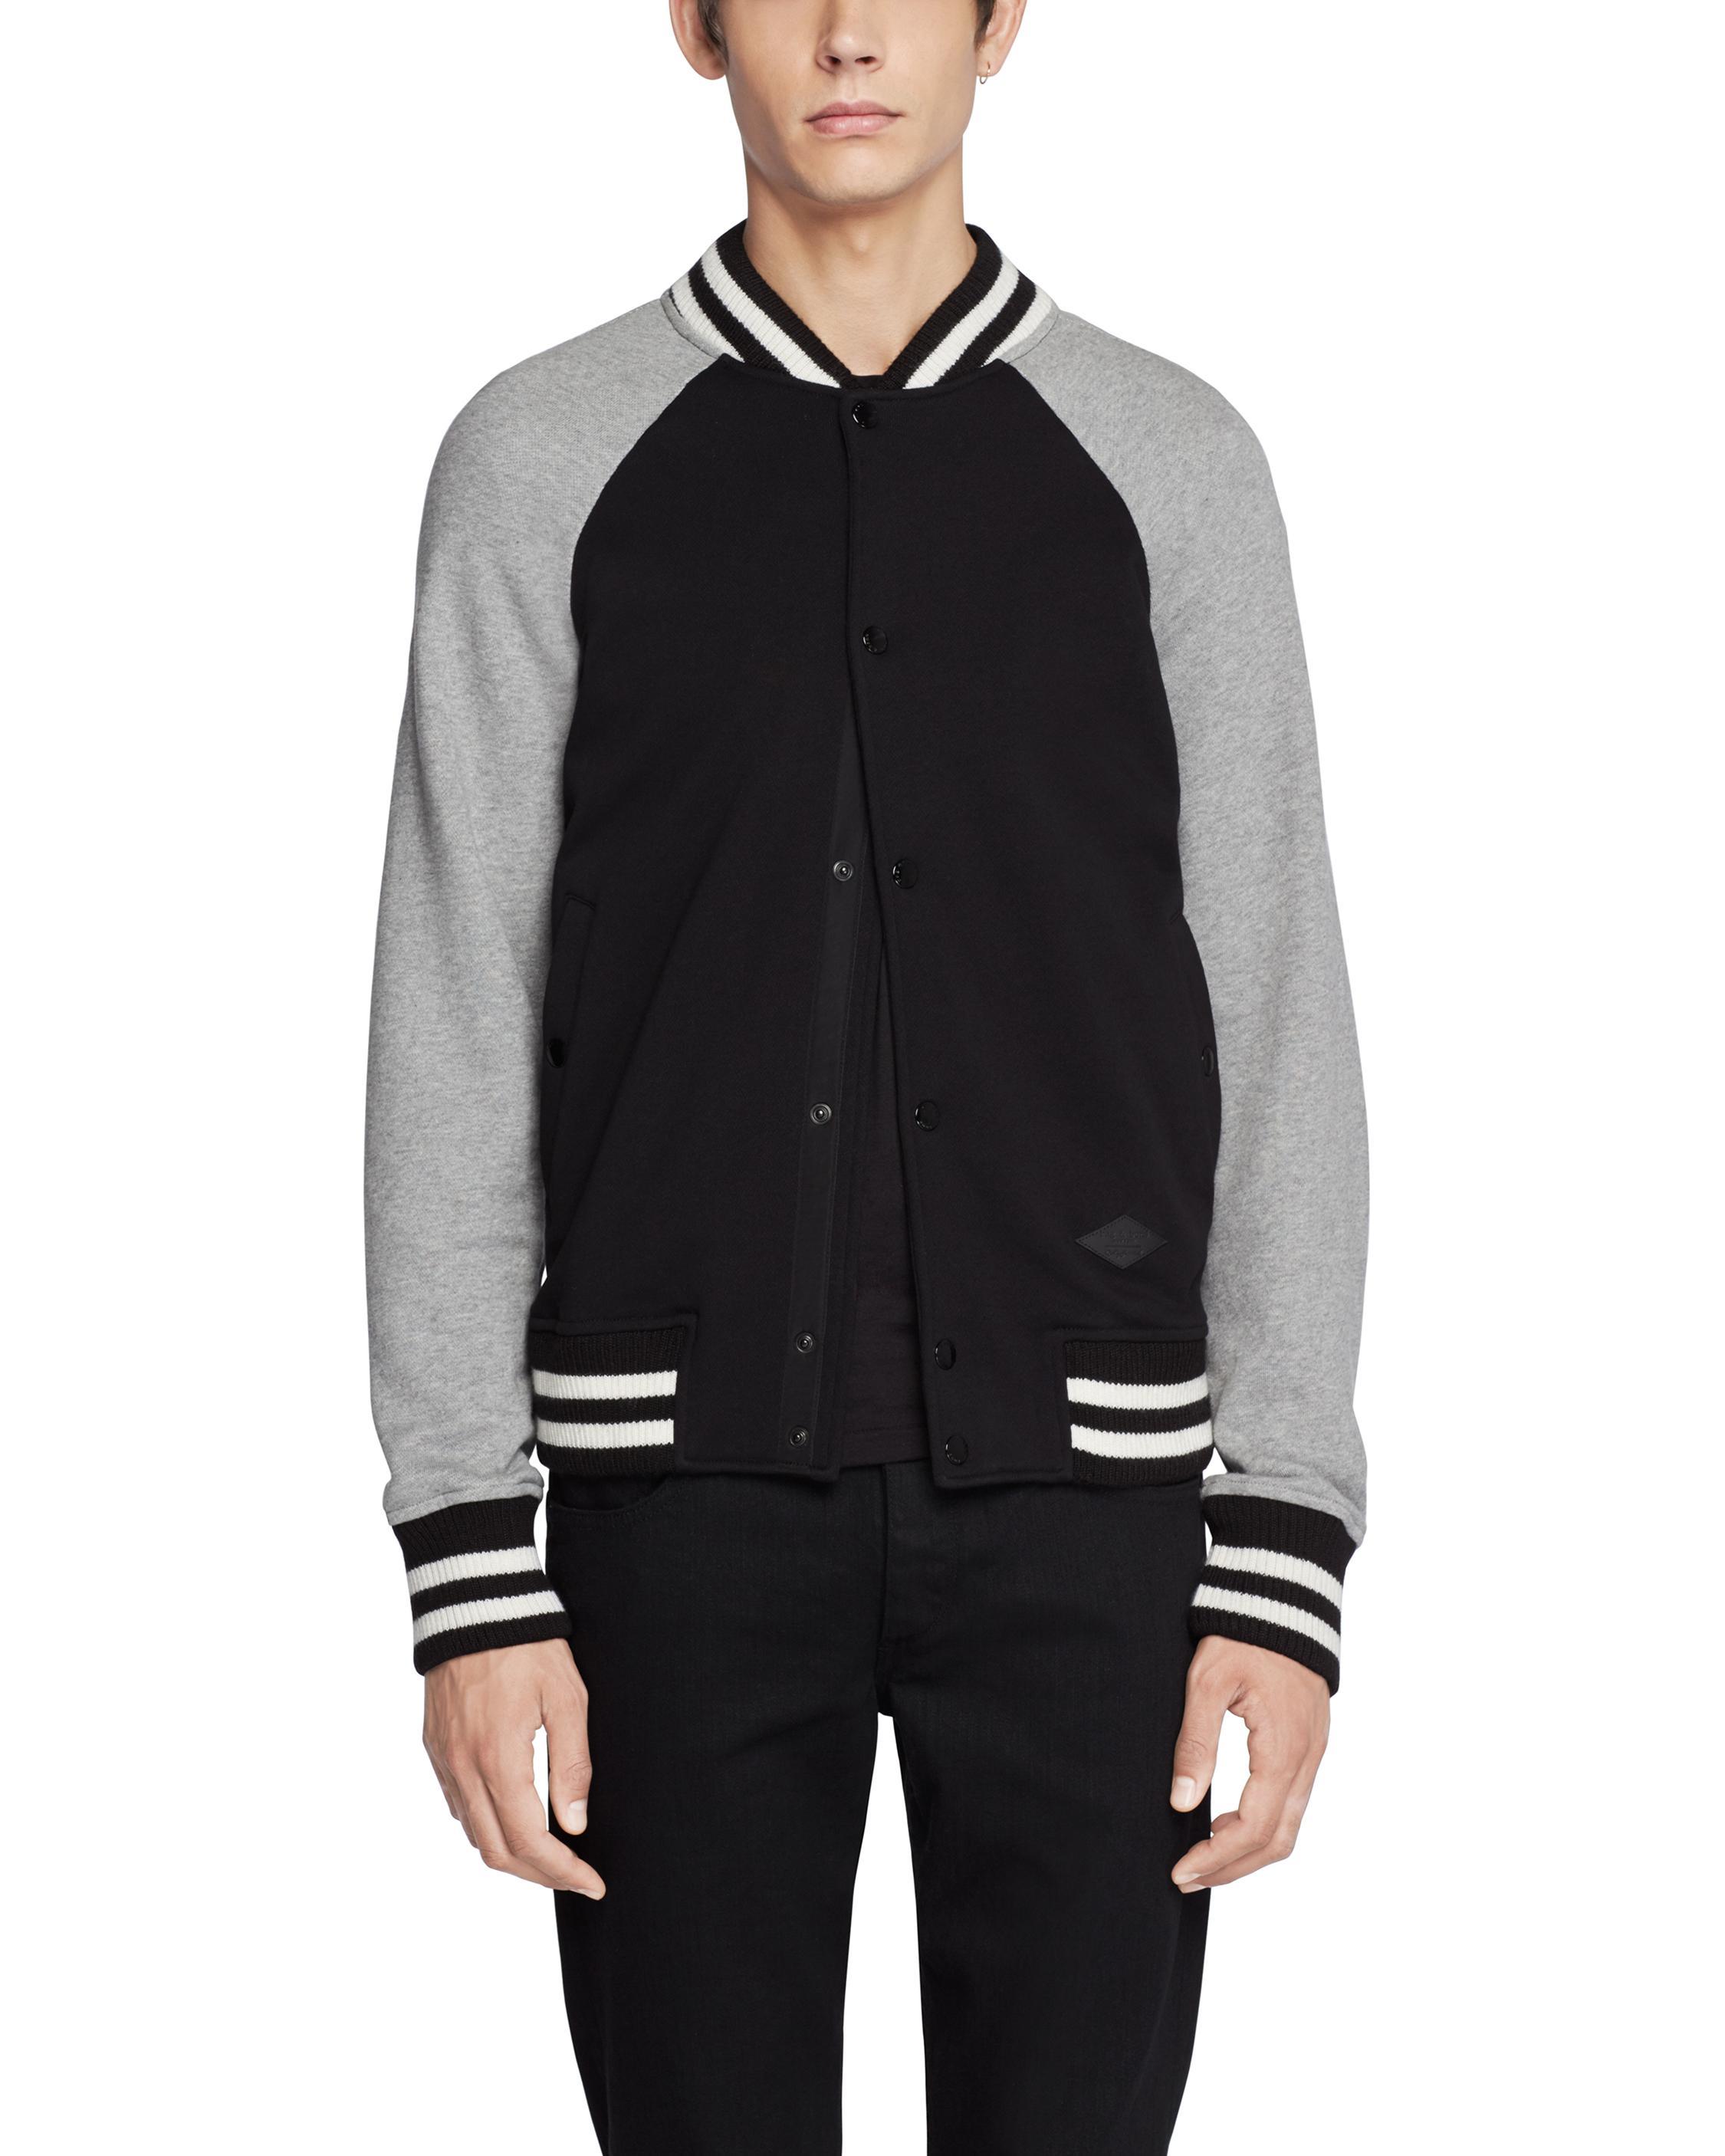 ef3625e3c32b Arden Varsity Jacket